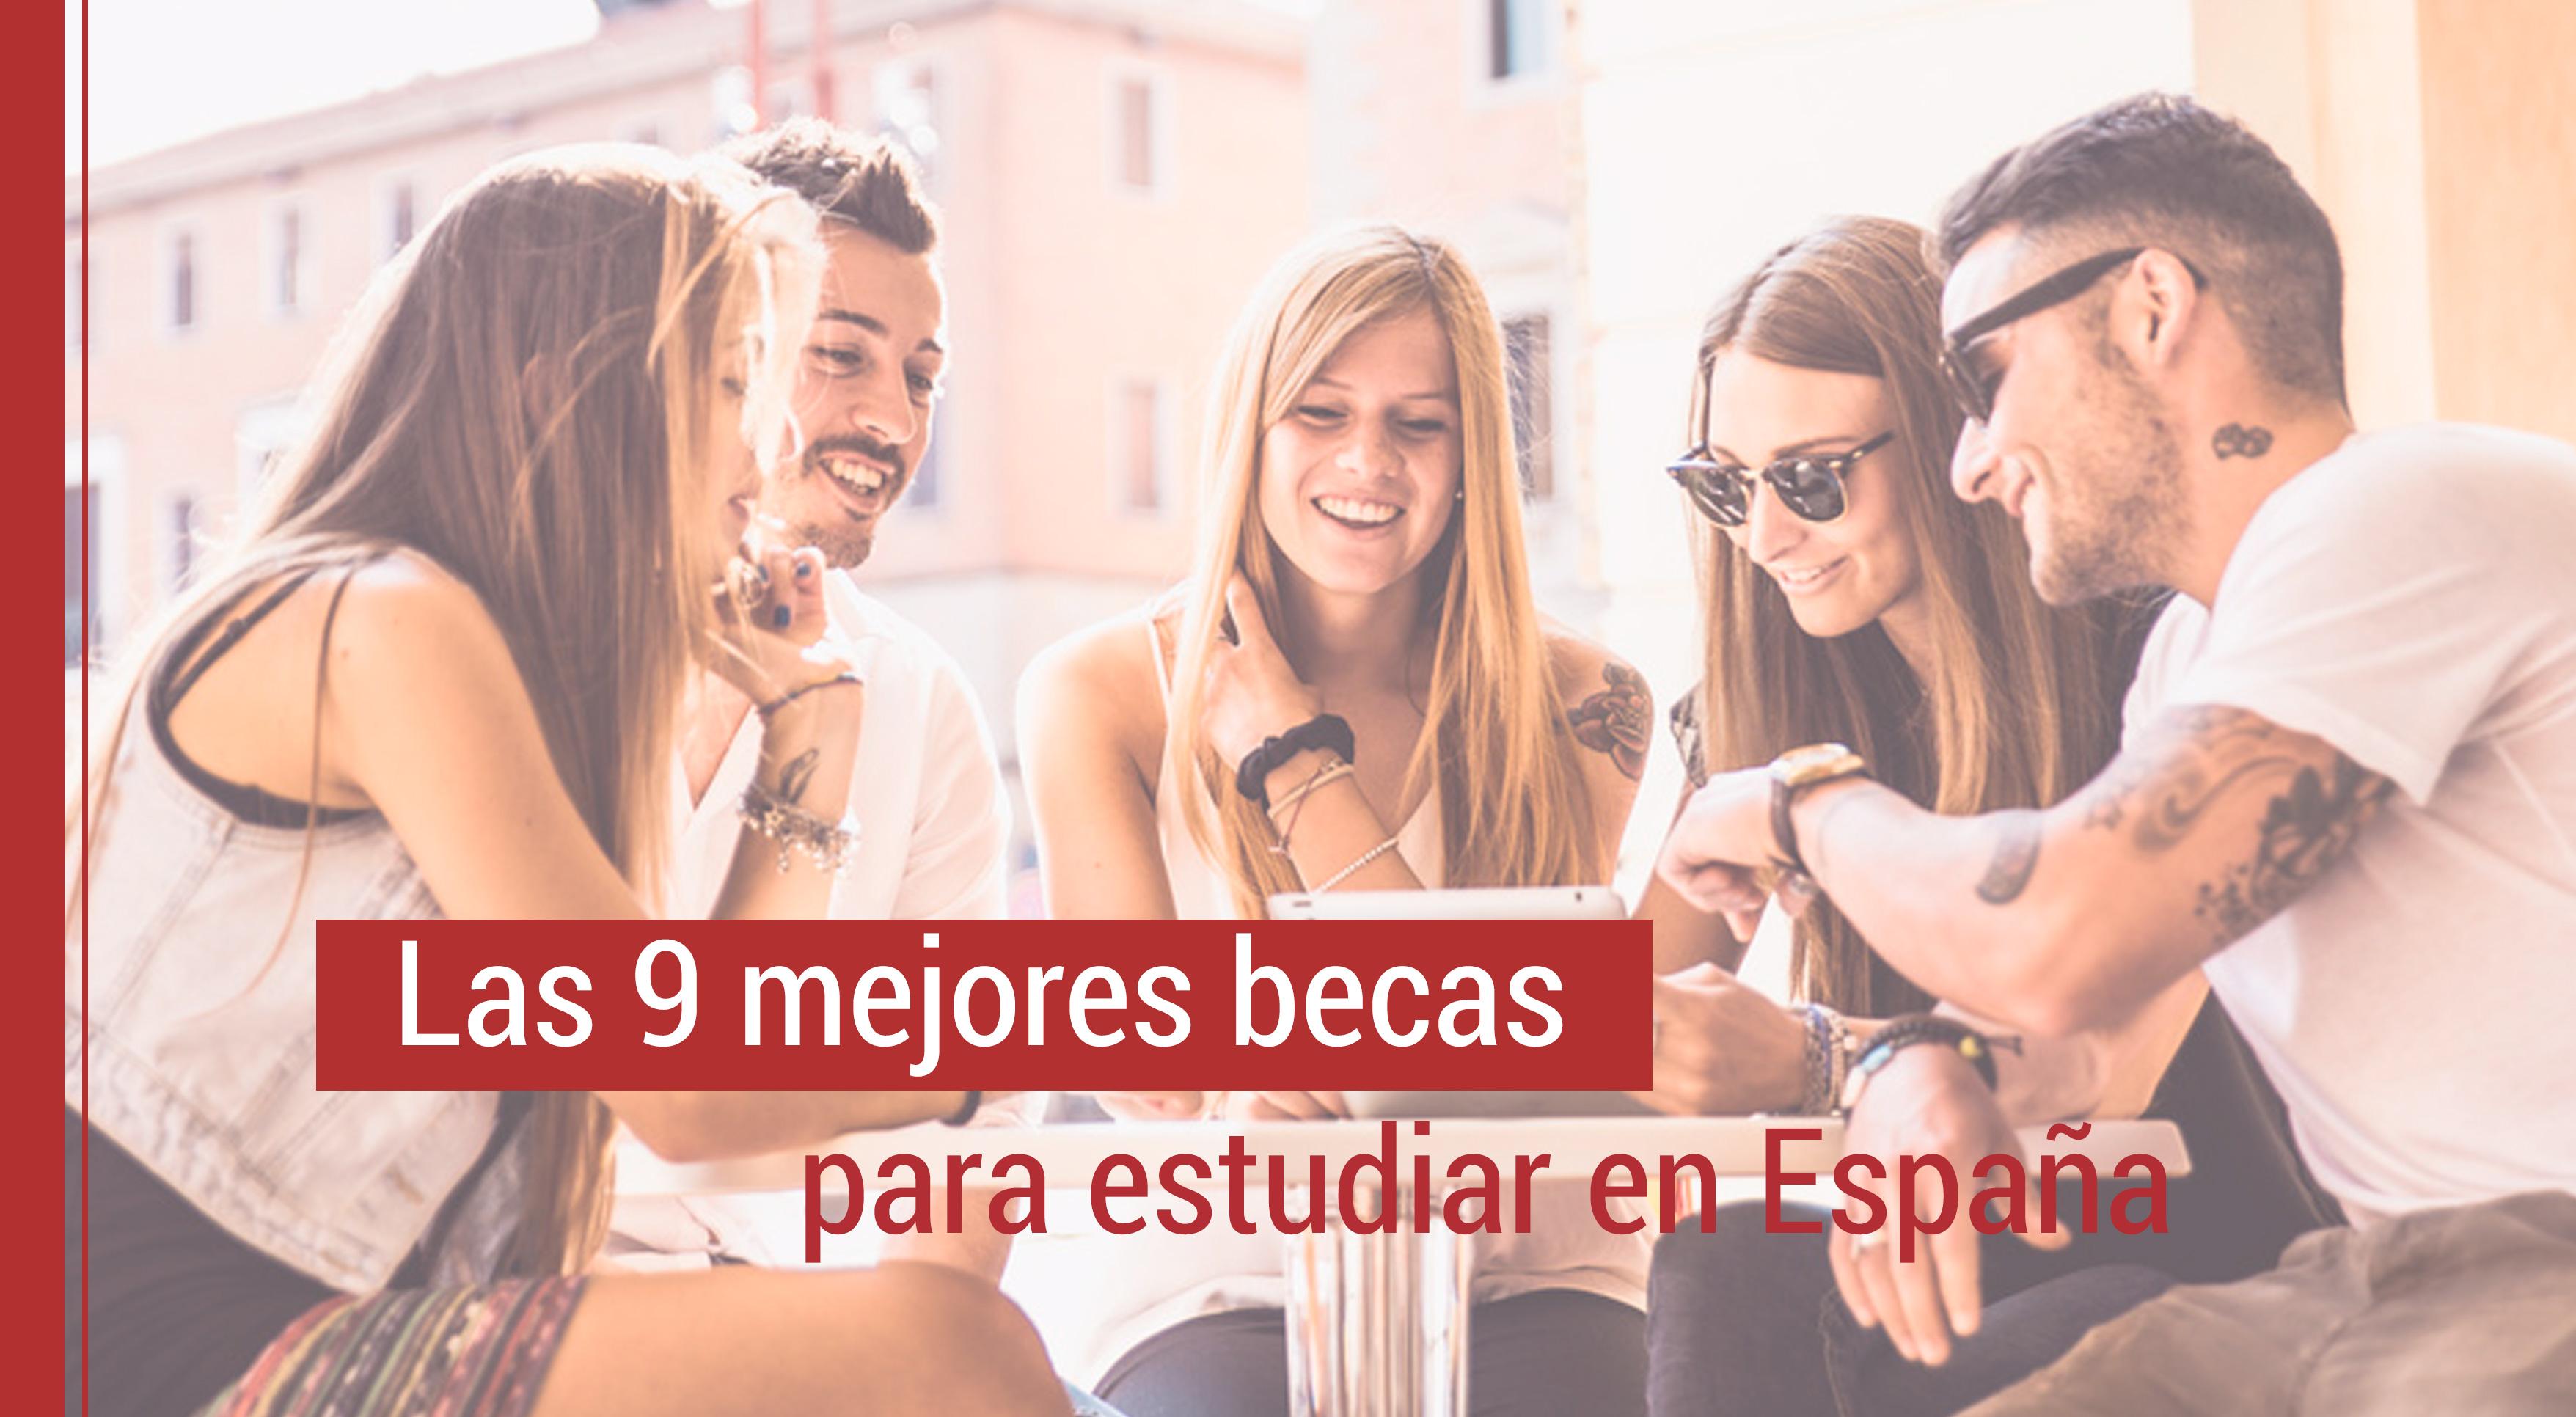 mejores-becas-estudiar-espana Las mejores becas para estudiar en España